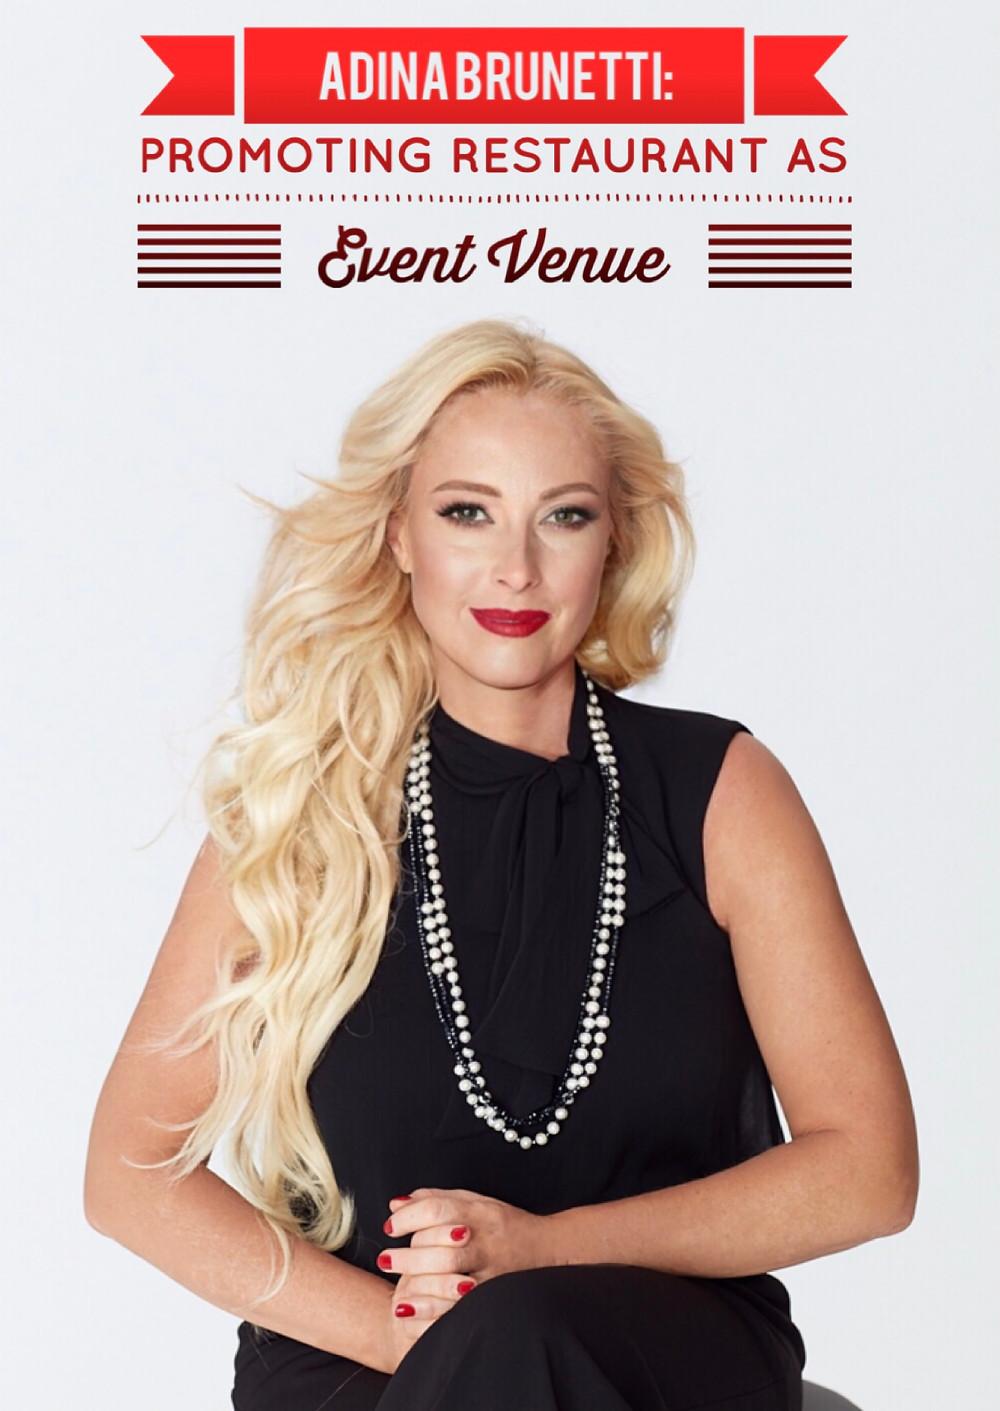 Adina Brunetti: Promoting Restaurant as Event Venue